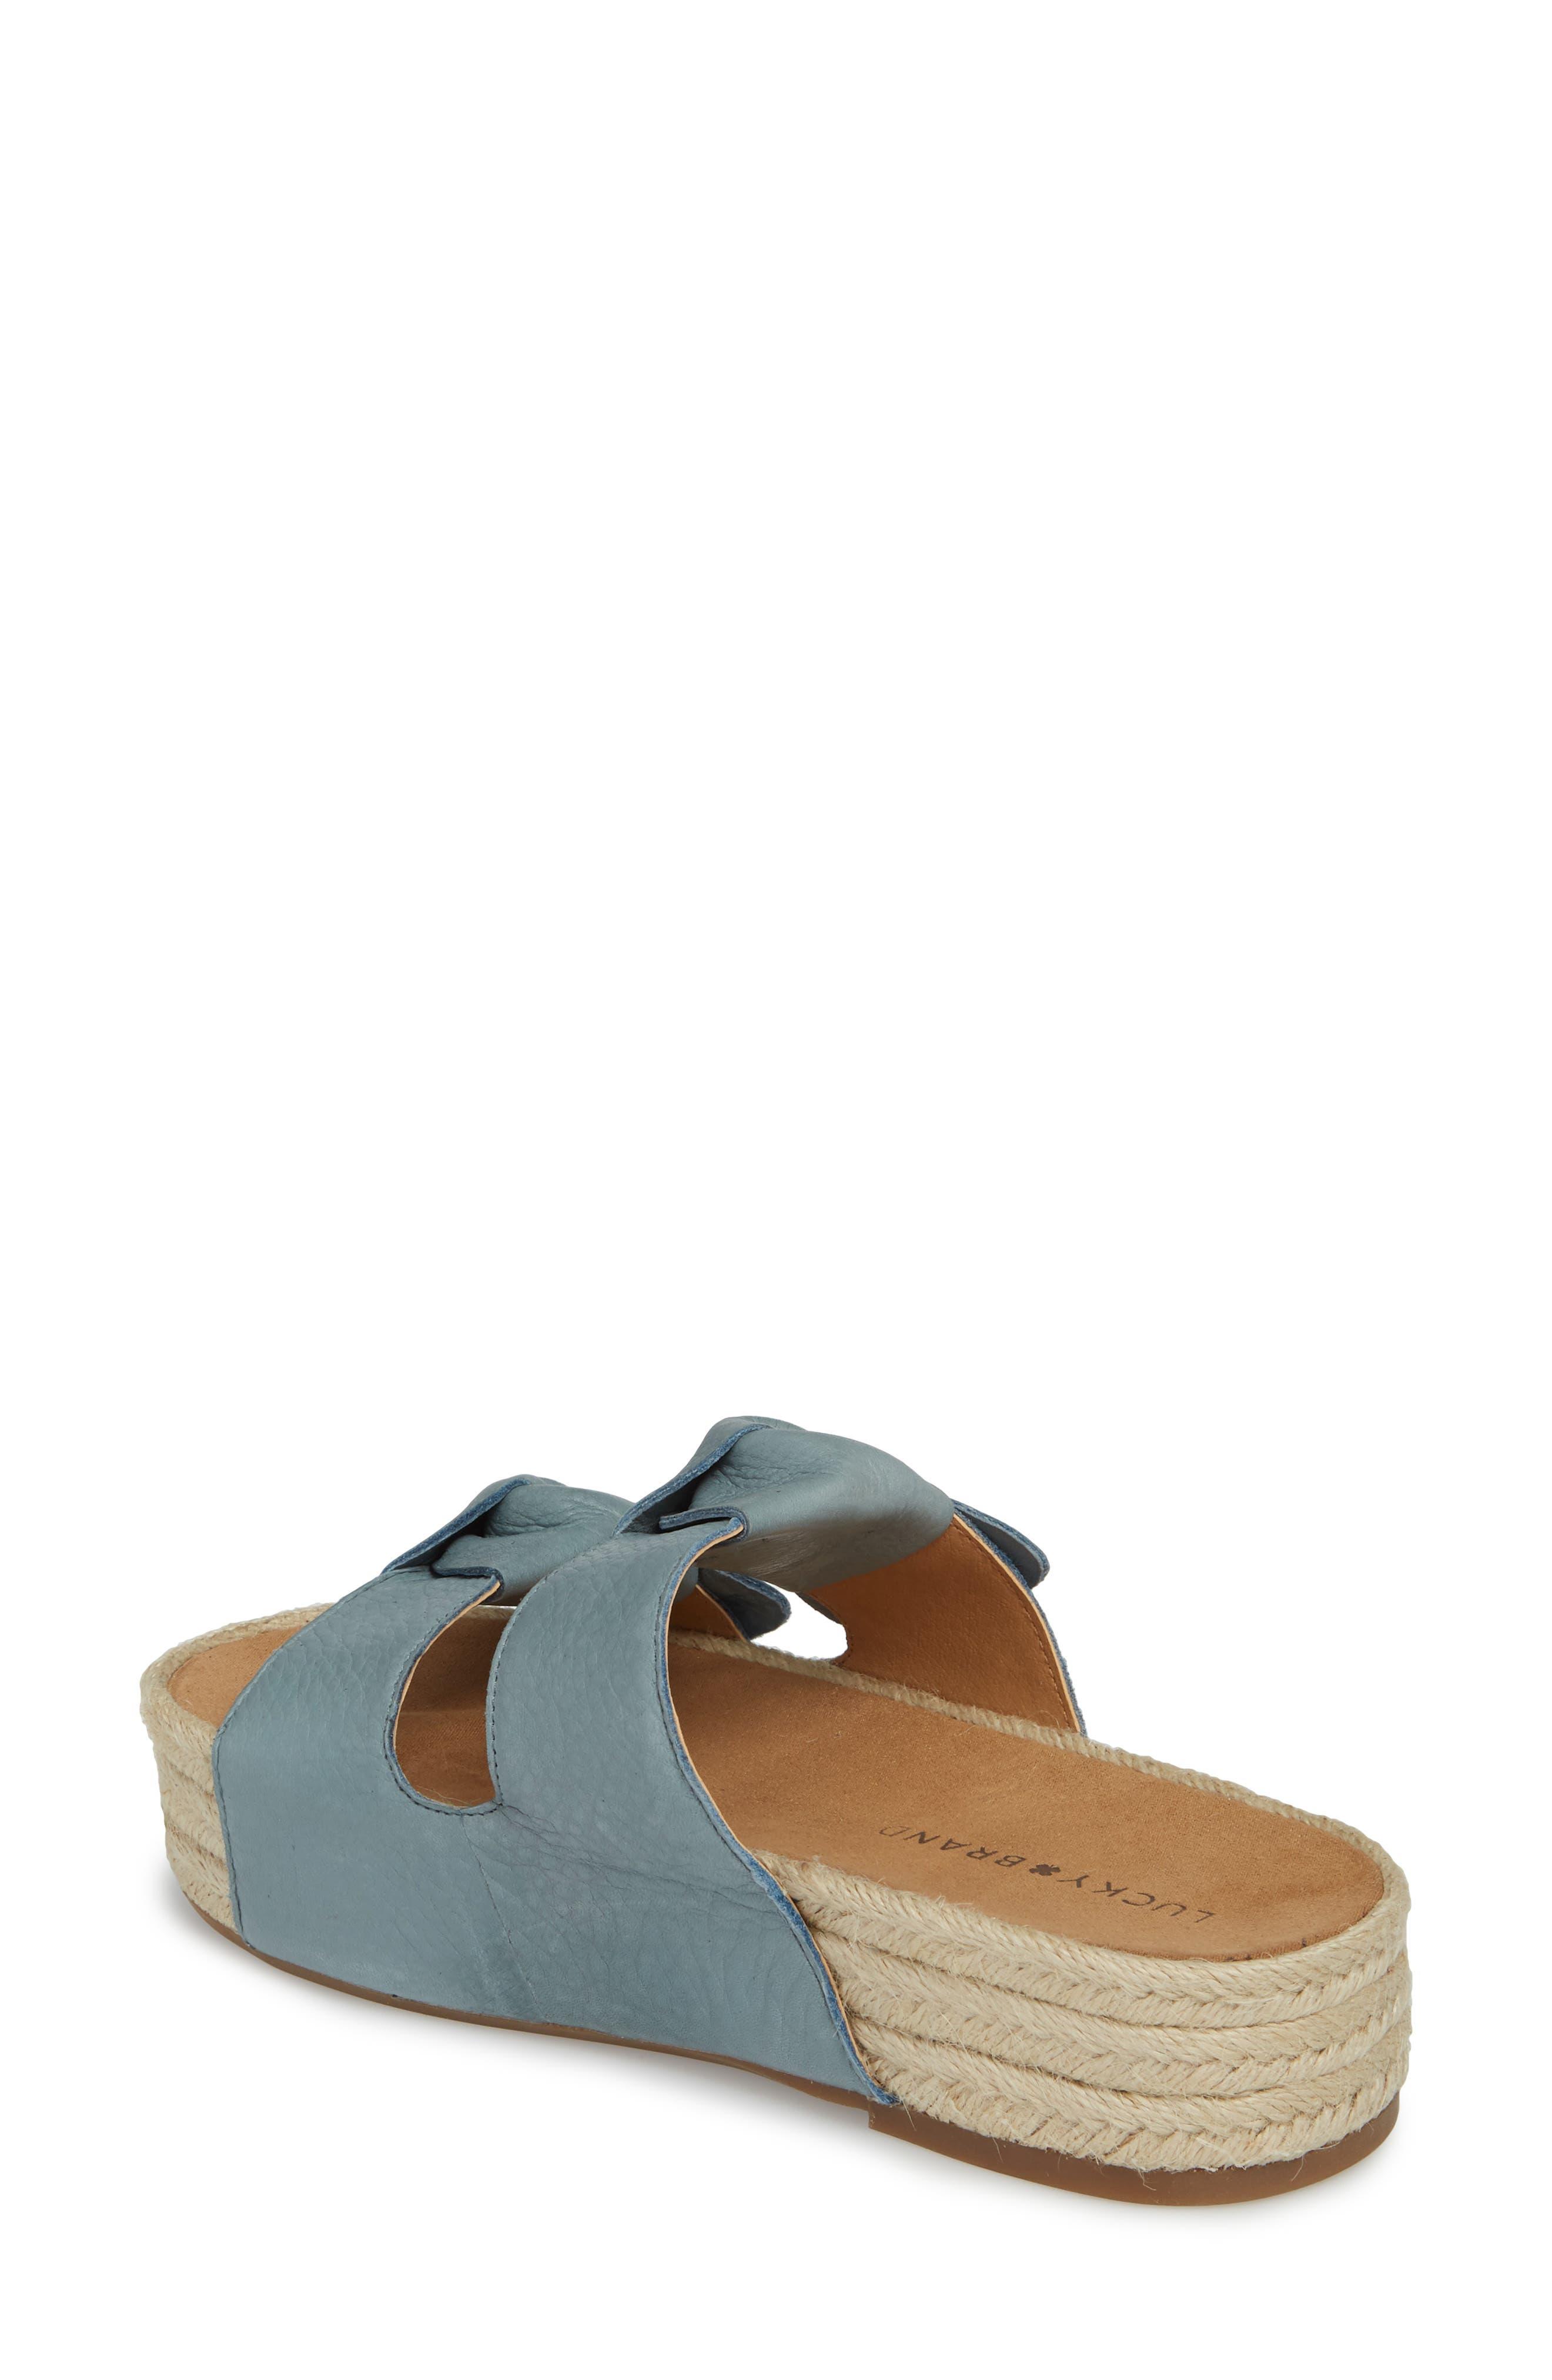 Izbremma Platform Espadrille Sandal,                             Alternate thumbnail 2, color,                             Infinity Leather